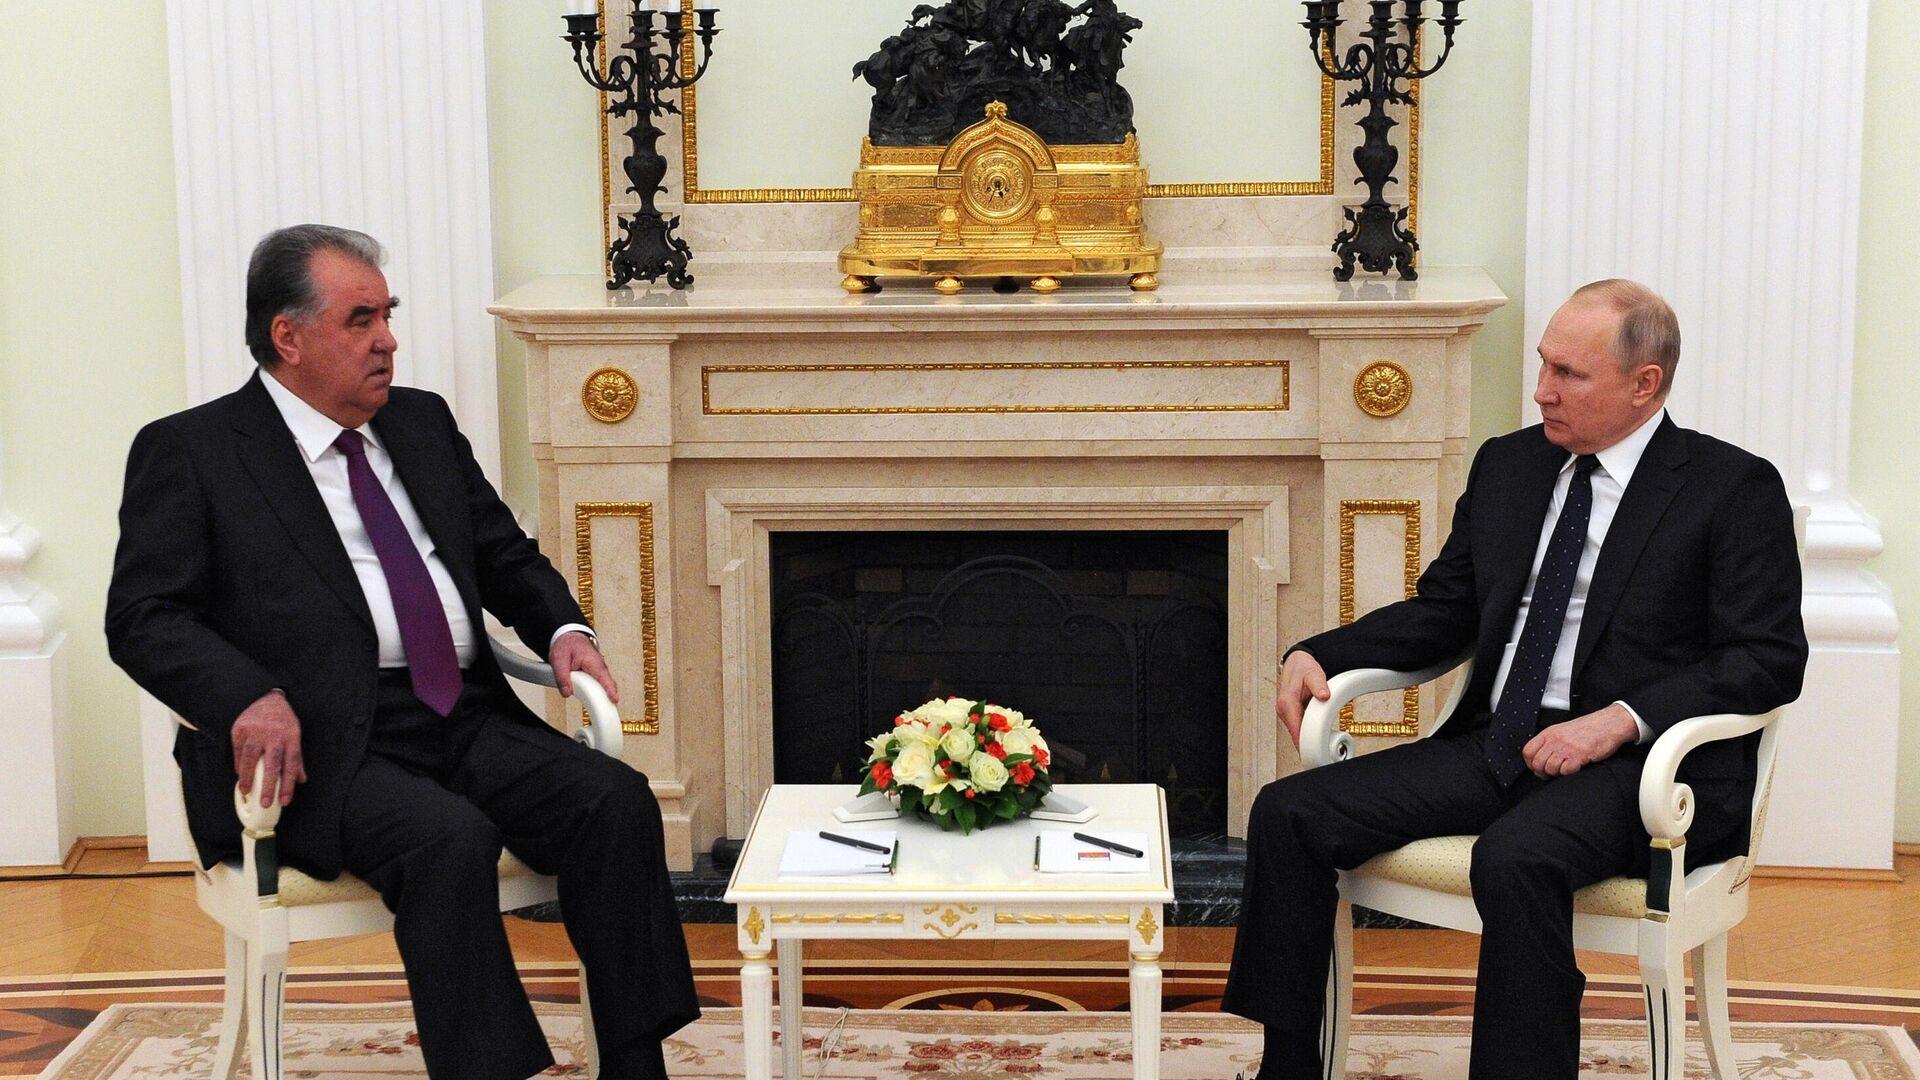 Президент РФ Владимир Путин и президент Таджикистана Эмомали Рахмон во время встречи - РИА Новости, 1920, 08.05.2021